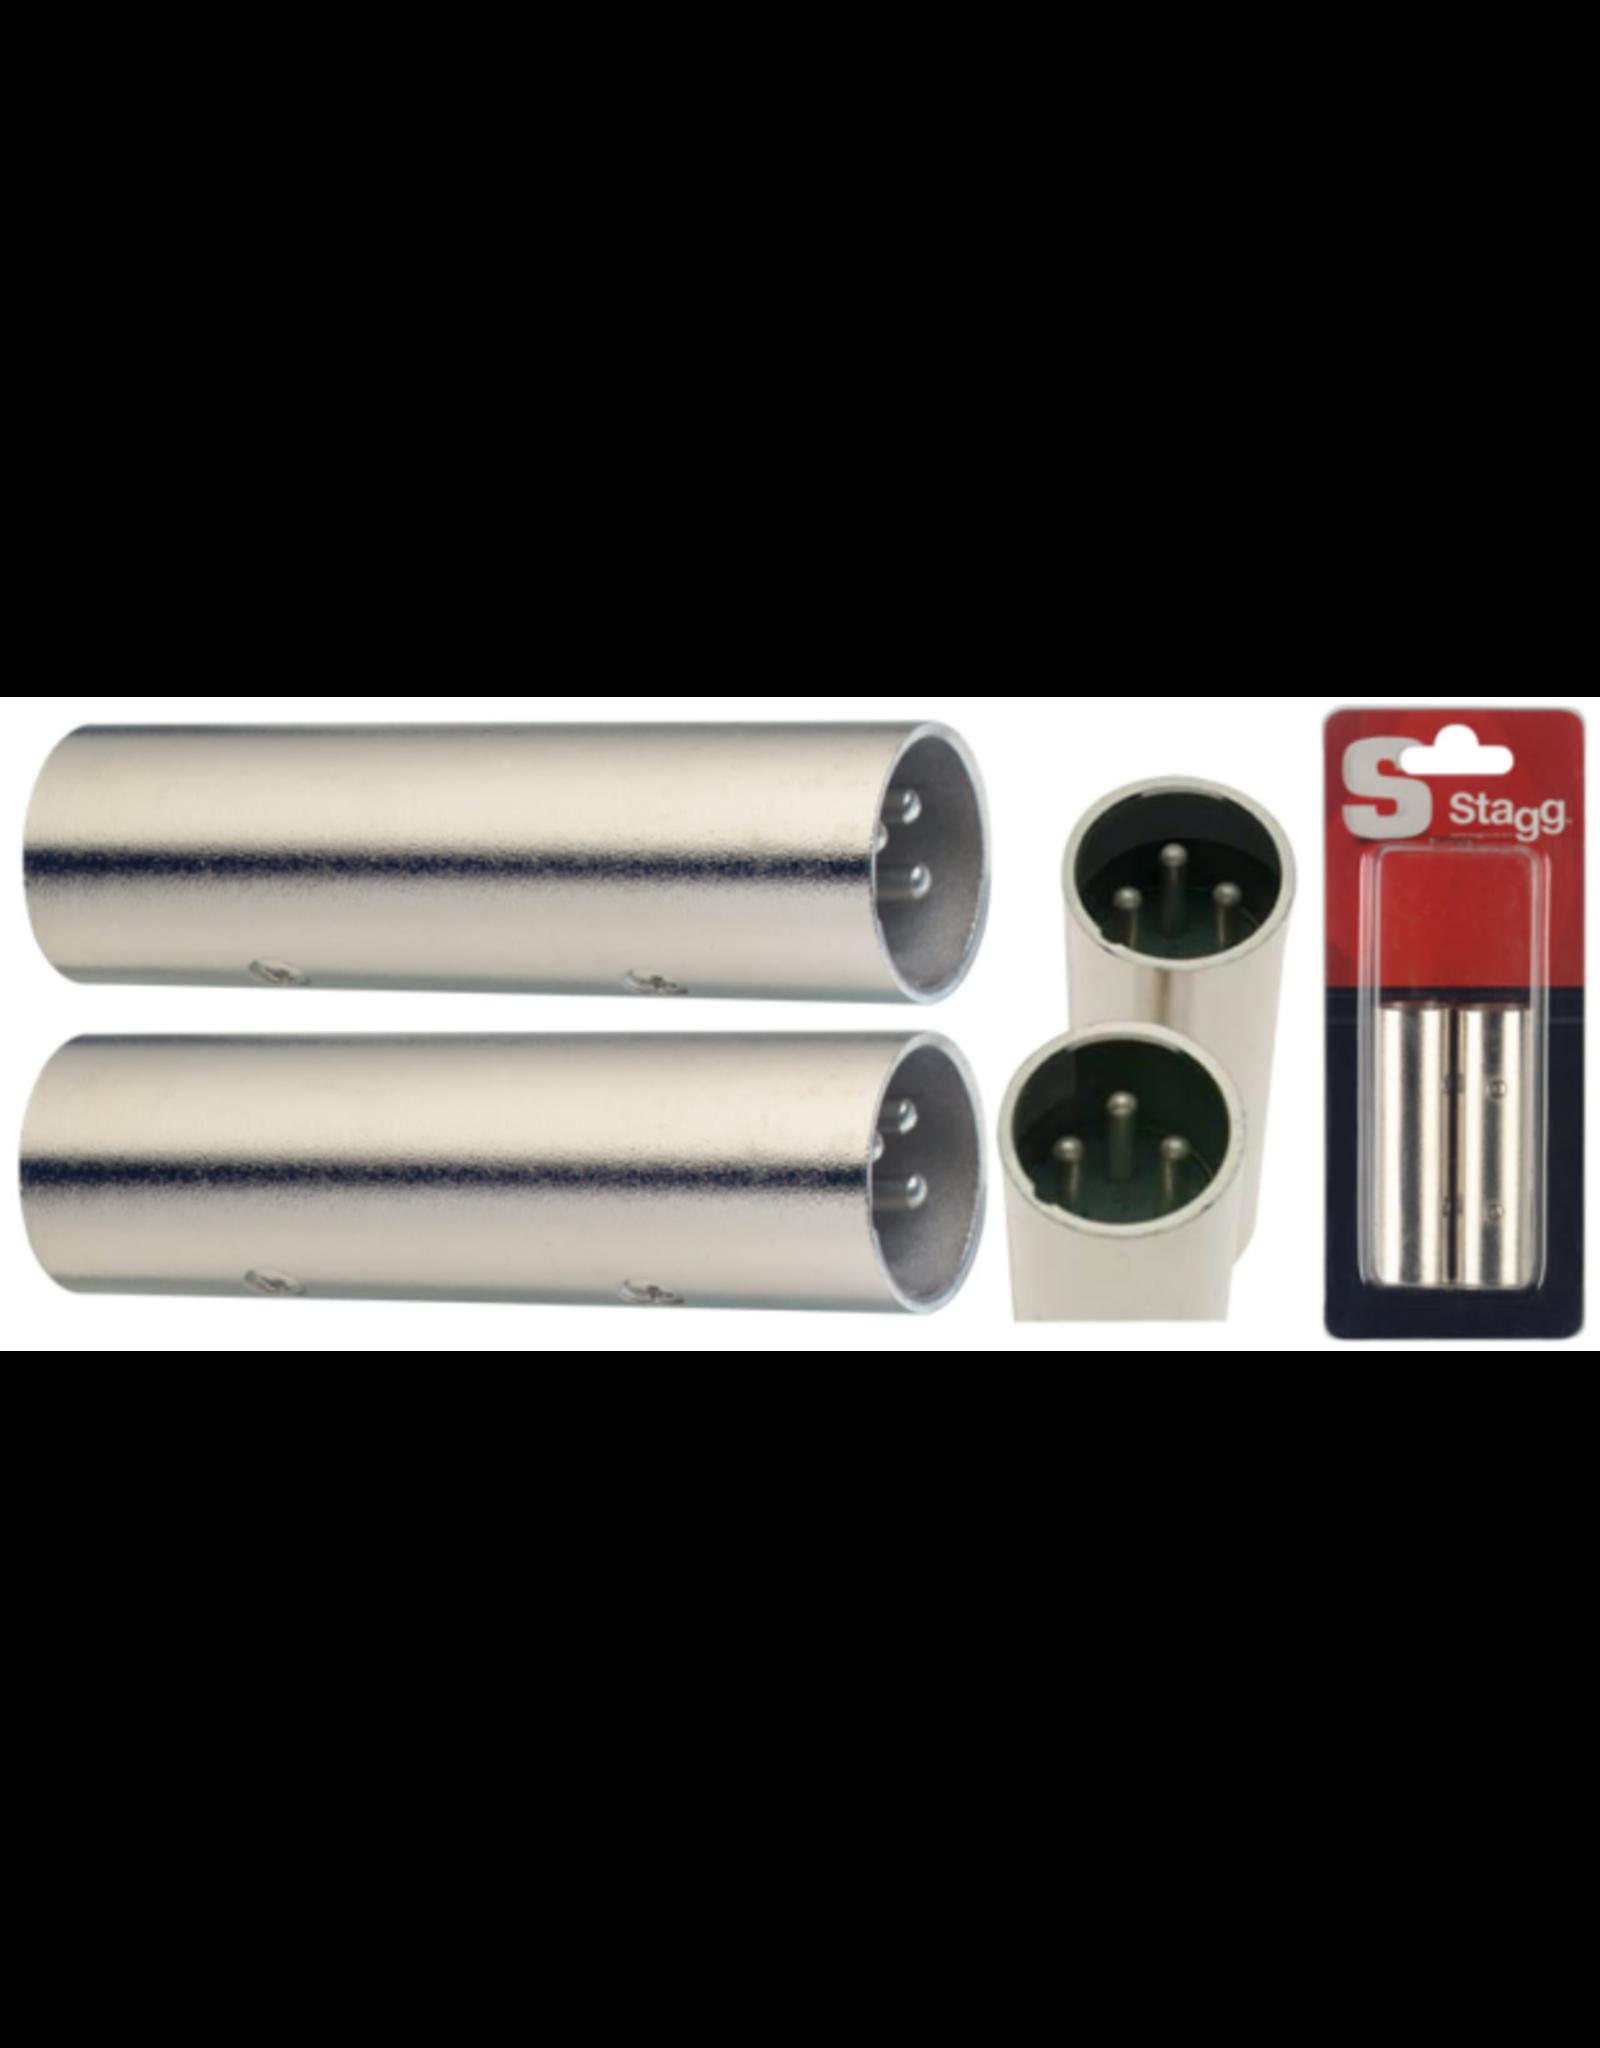 Stagg Stagg Symetrical Male XLR/Symetrical Male XLR Adaptor 2 Pack